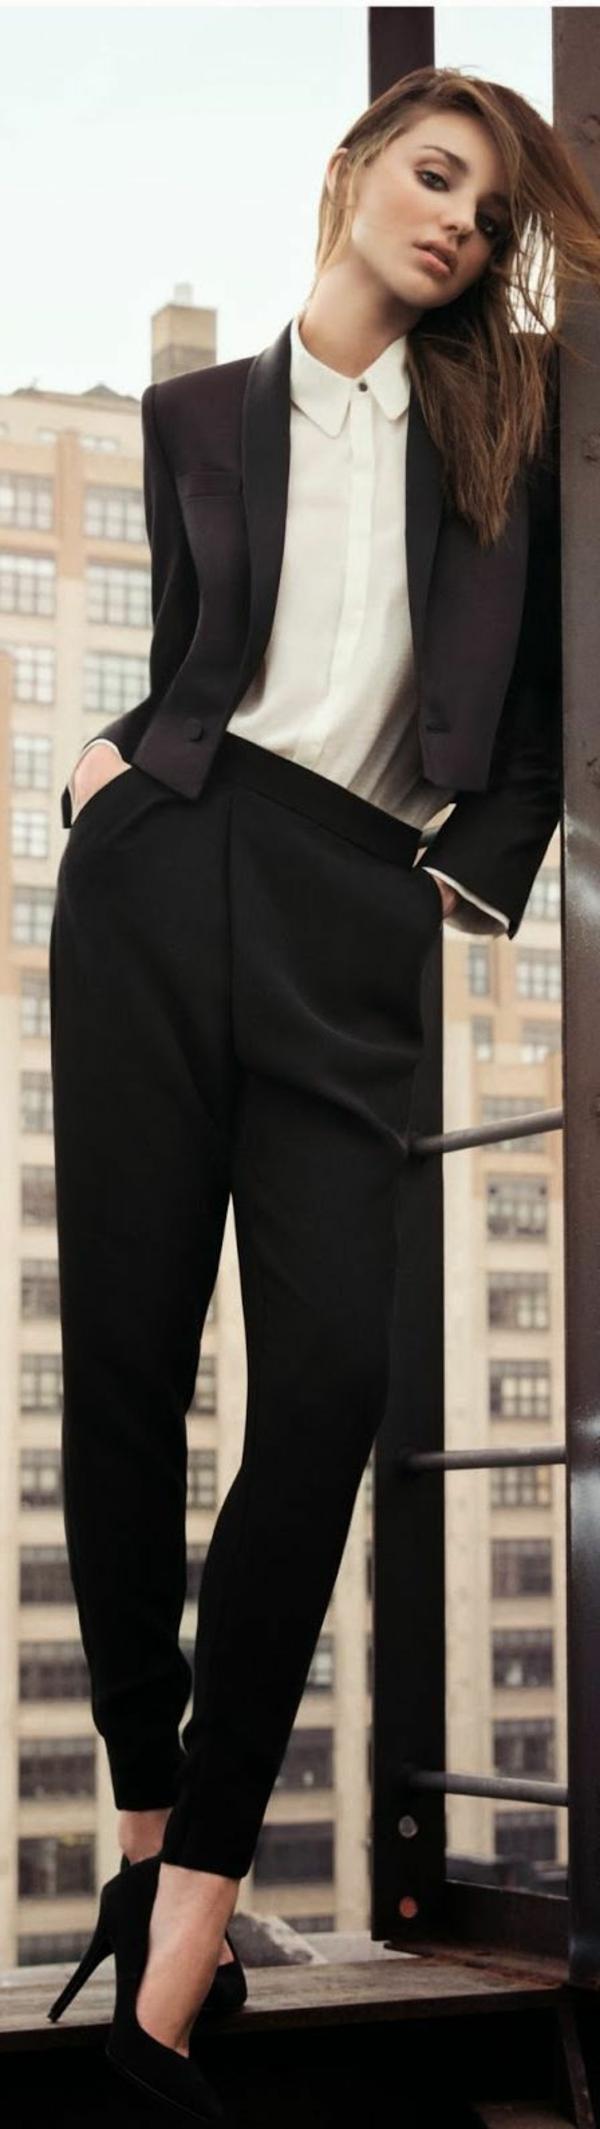 1-pantalon-taille-haute-noir